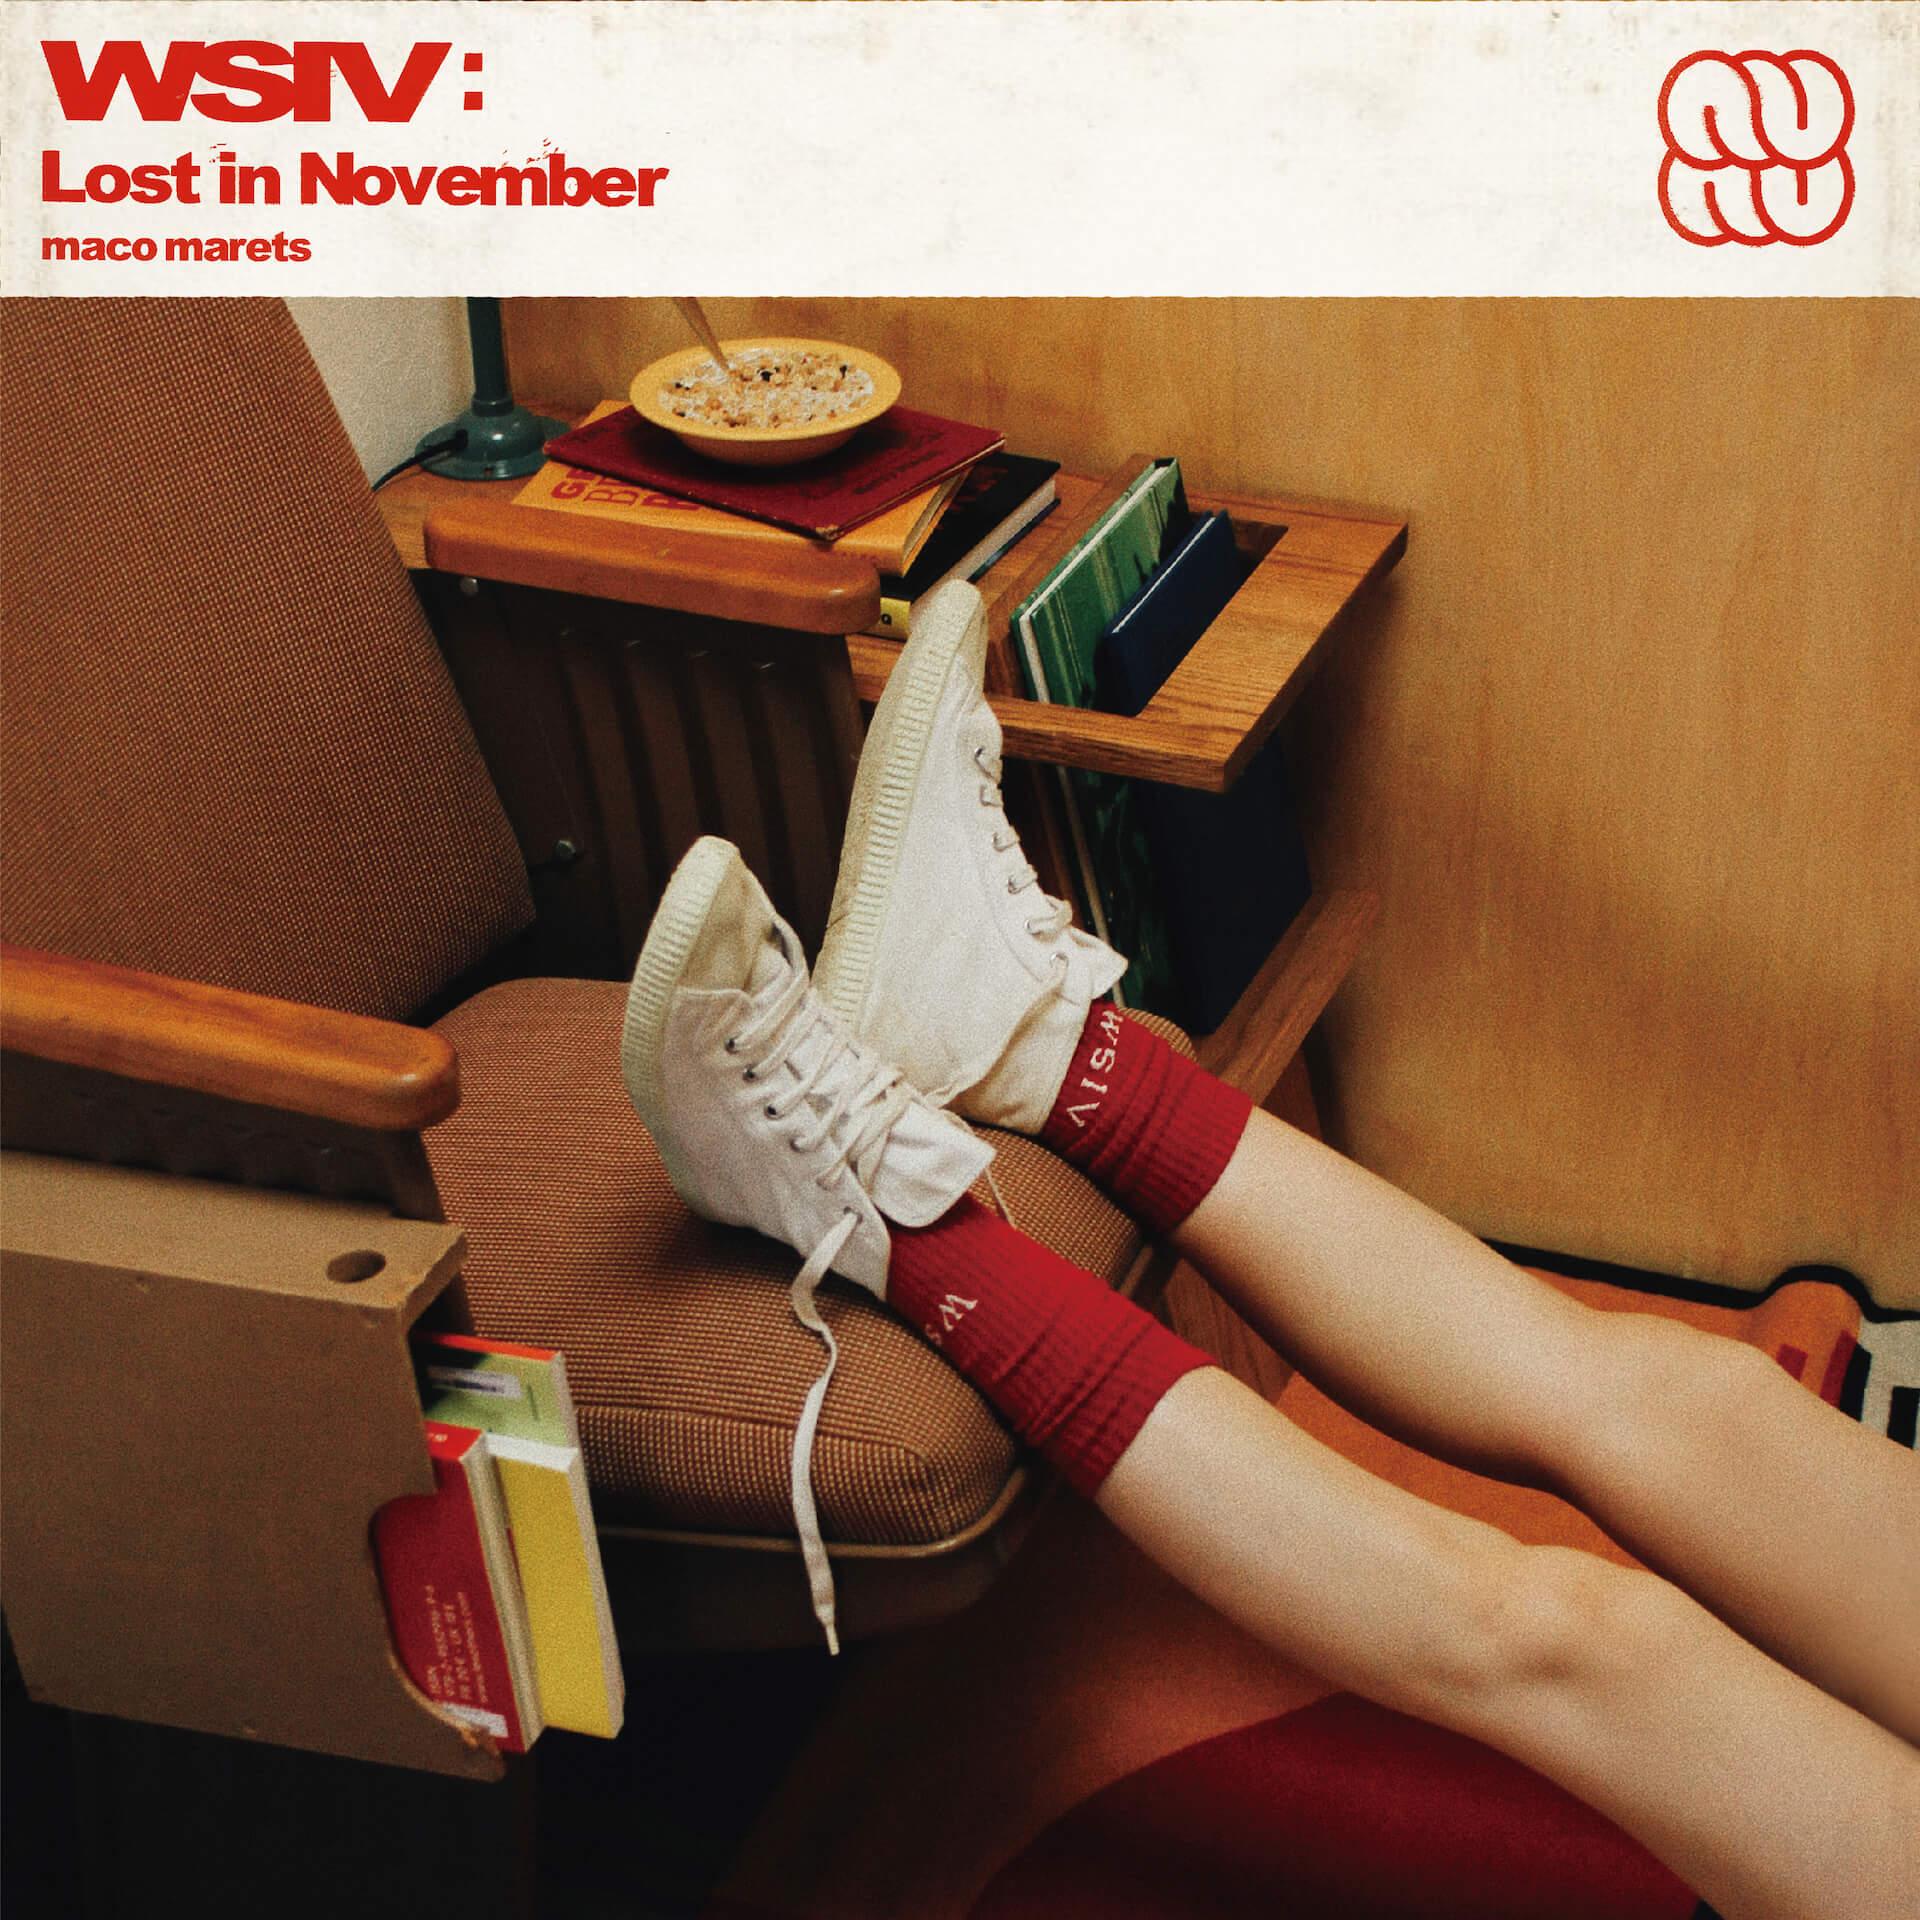 maco maretsが5thアルバム『WSIV:Lost in November』をリリース決定!週末CITY PLAY BOYZ・BUGS、さとうもか、Shin Sakiuraらが参加 eedc6273629143eb5e49be87d09018cb